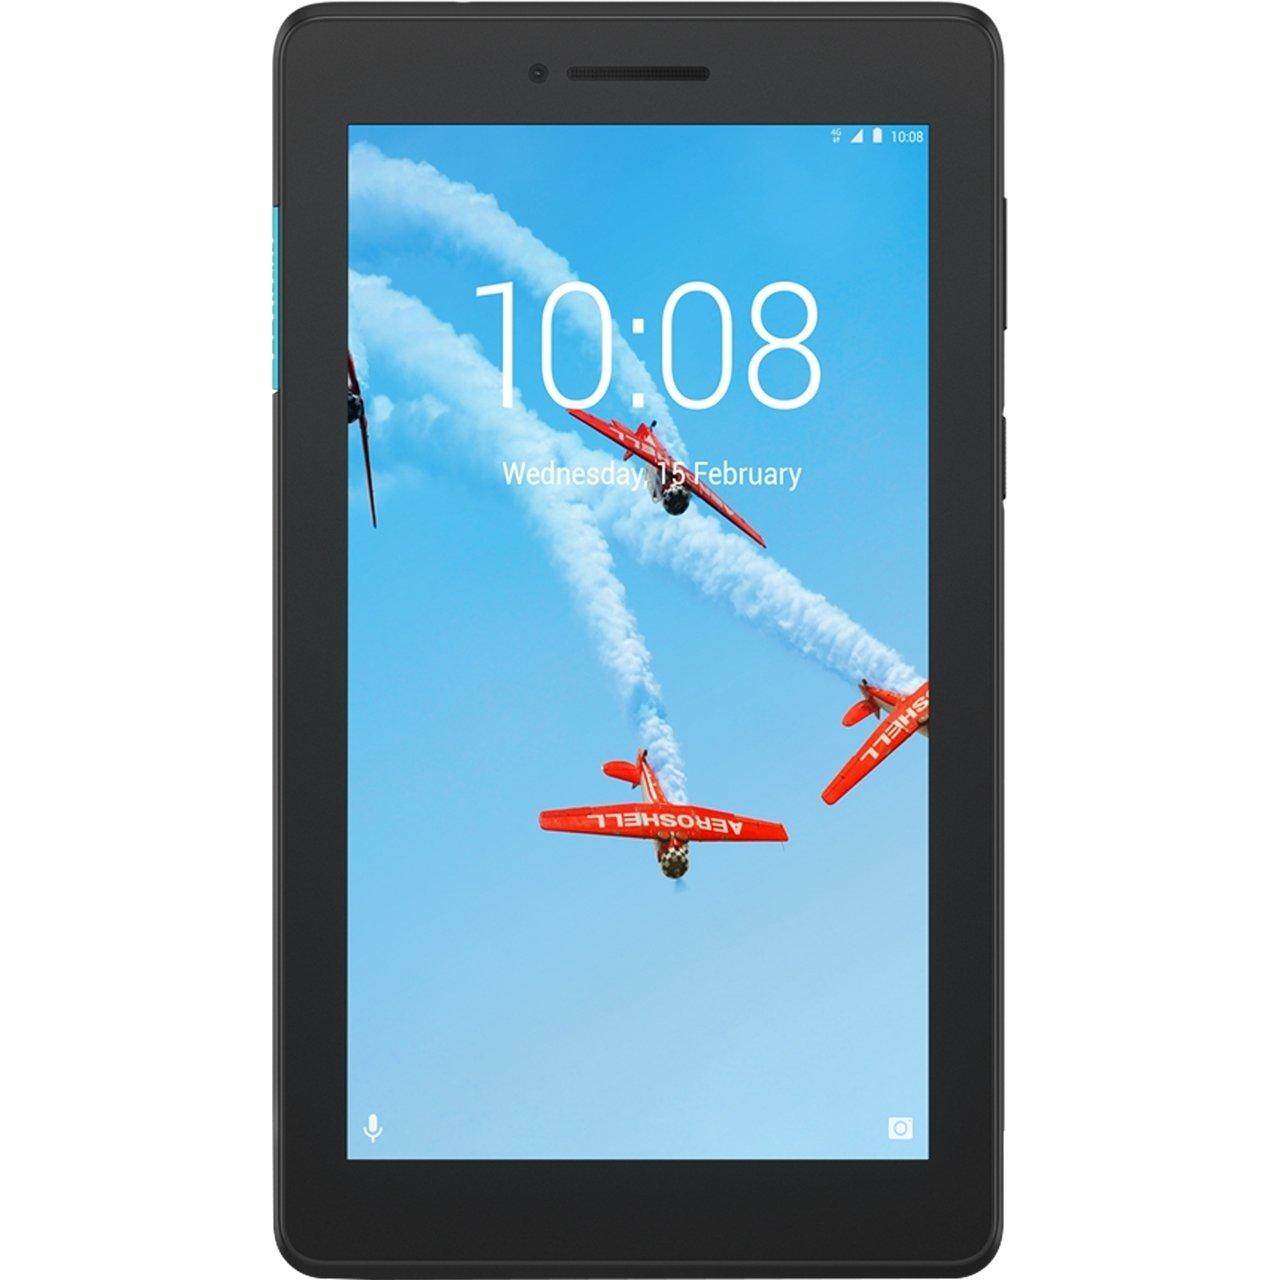 Lenovo E7 7 Inch 16GB Tablet - Black - £39.99 @ Argos